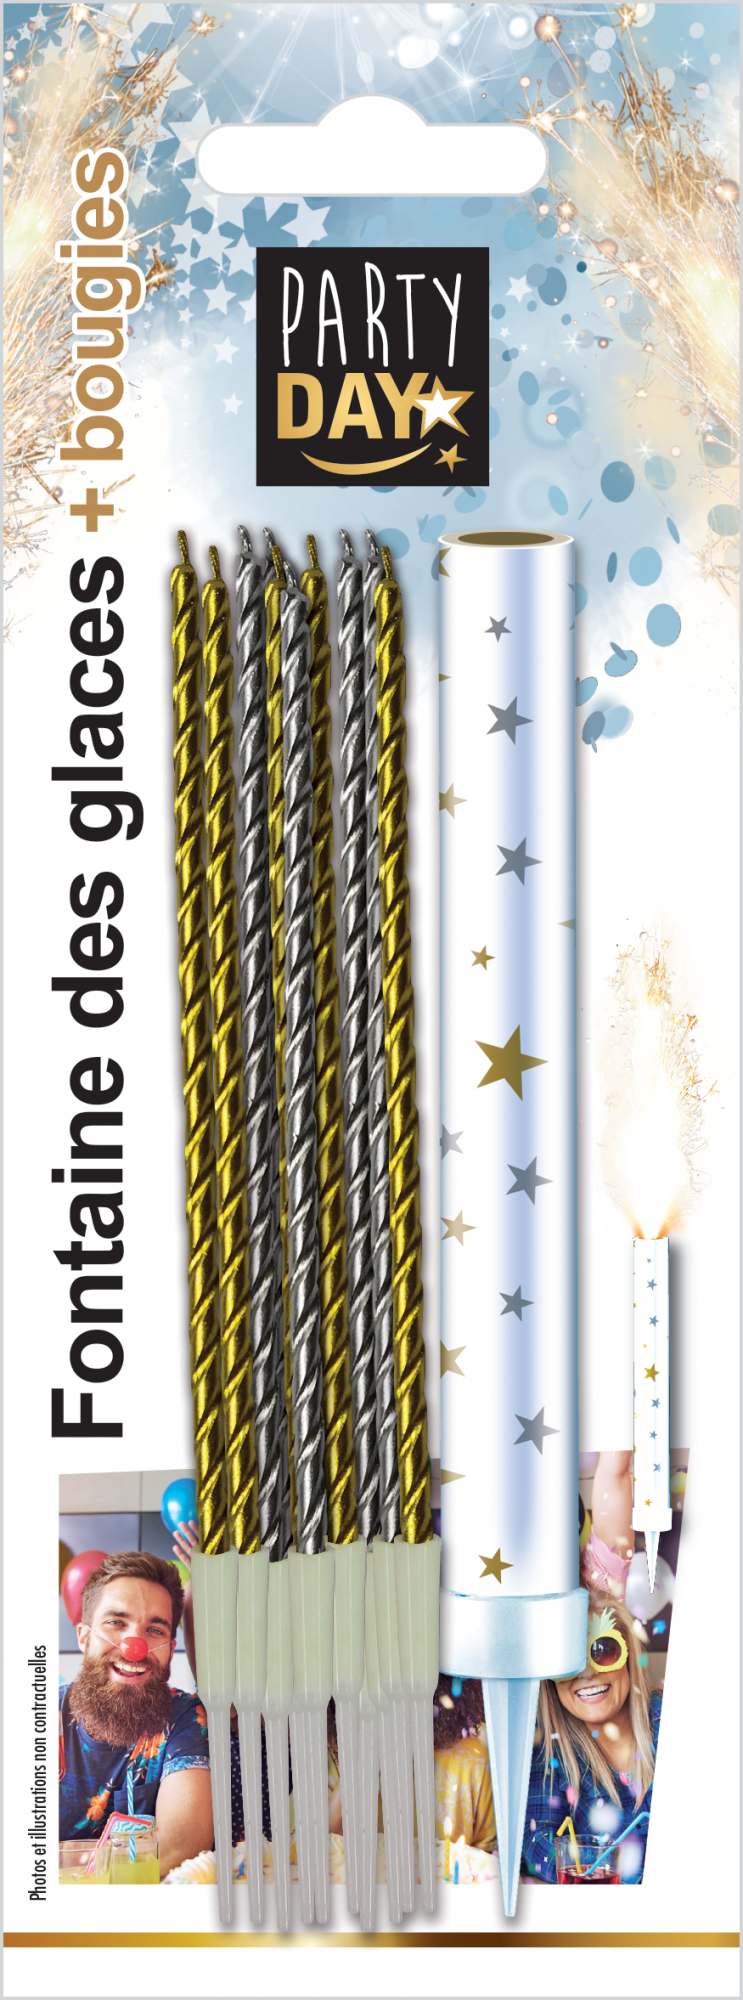 P166105-FONTAINE DES GLACES + BOUGIES OR & ARGENT